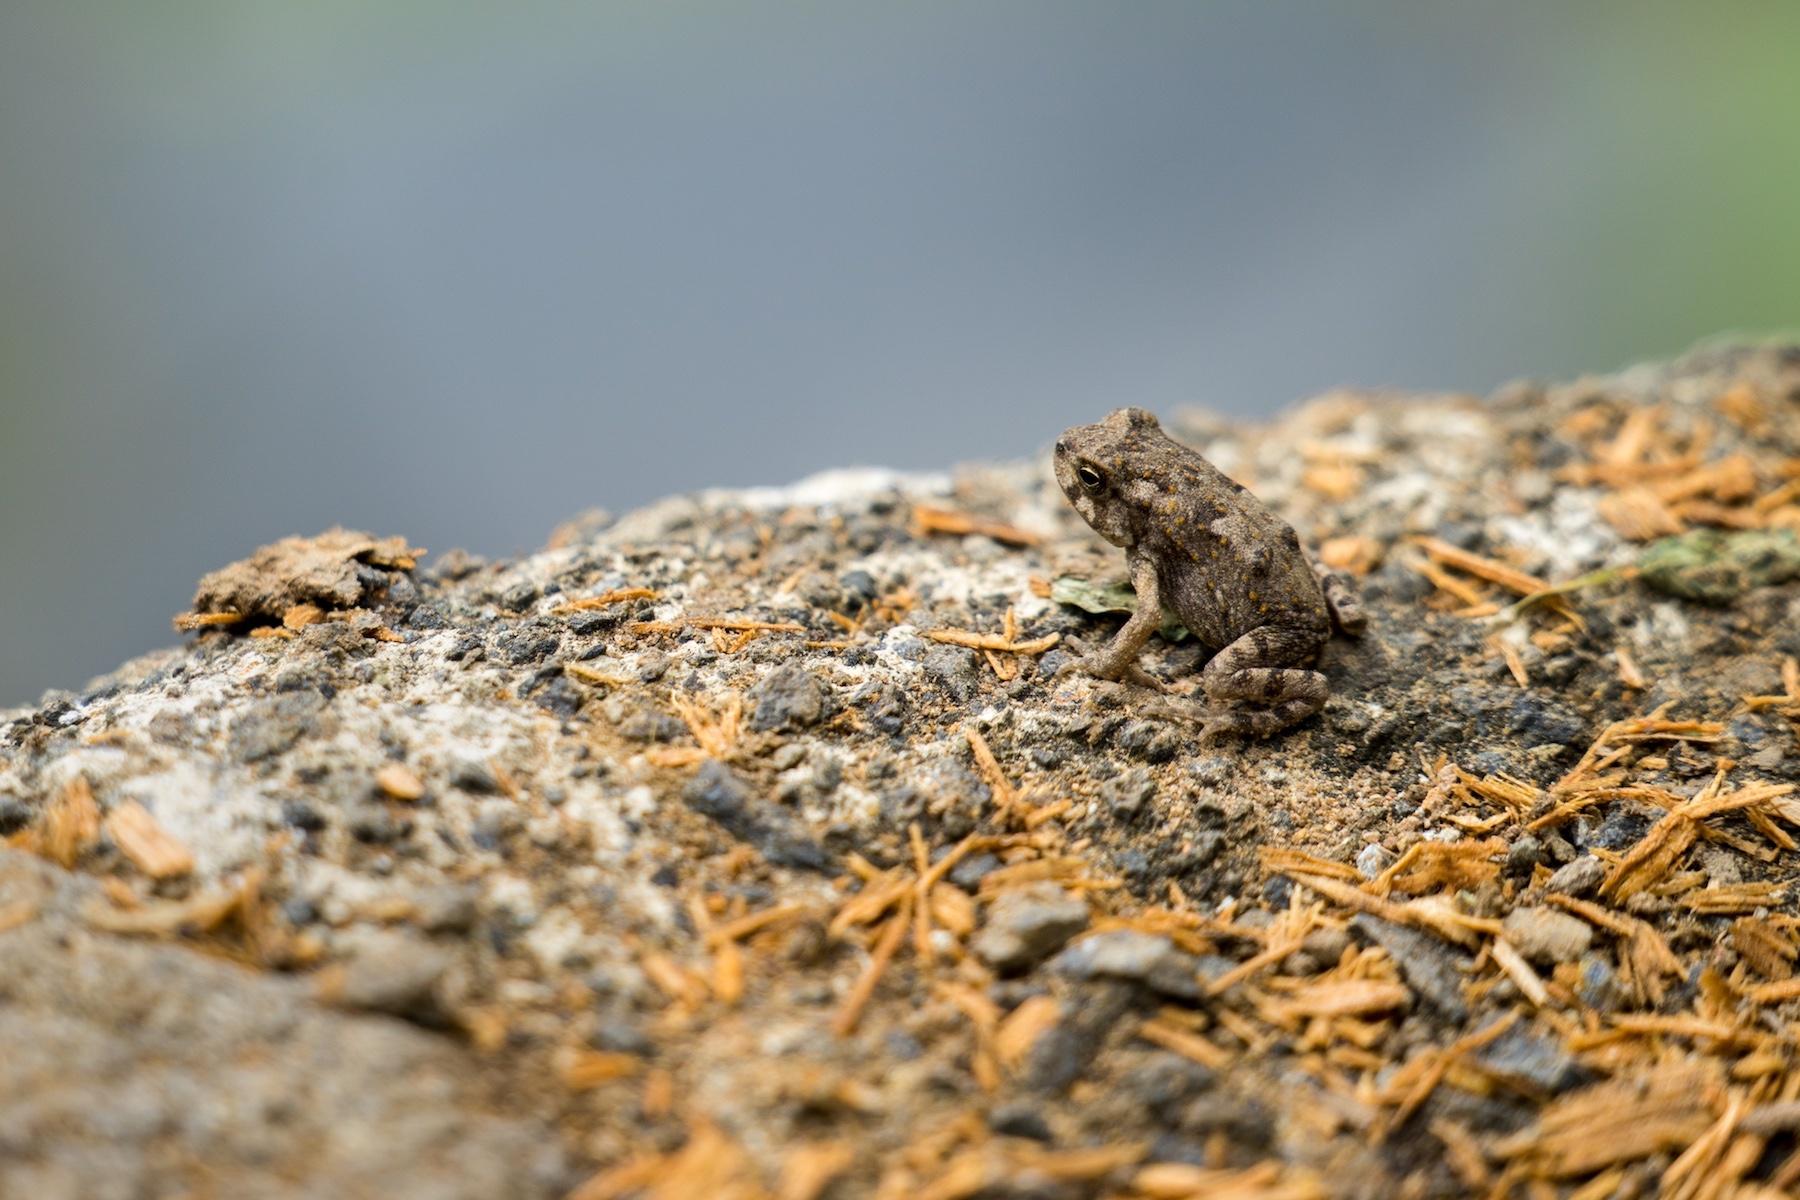 Cane Toad– Bundaberg, Australia